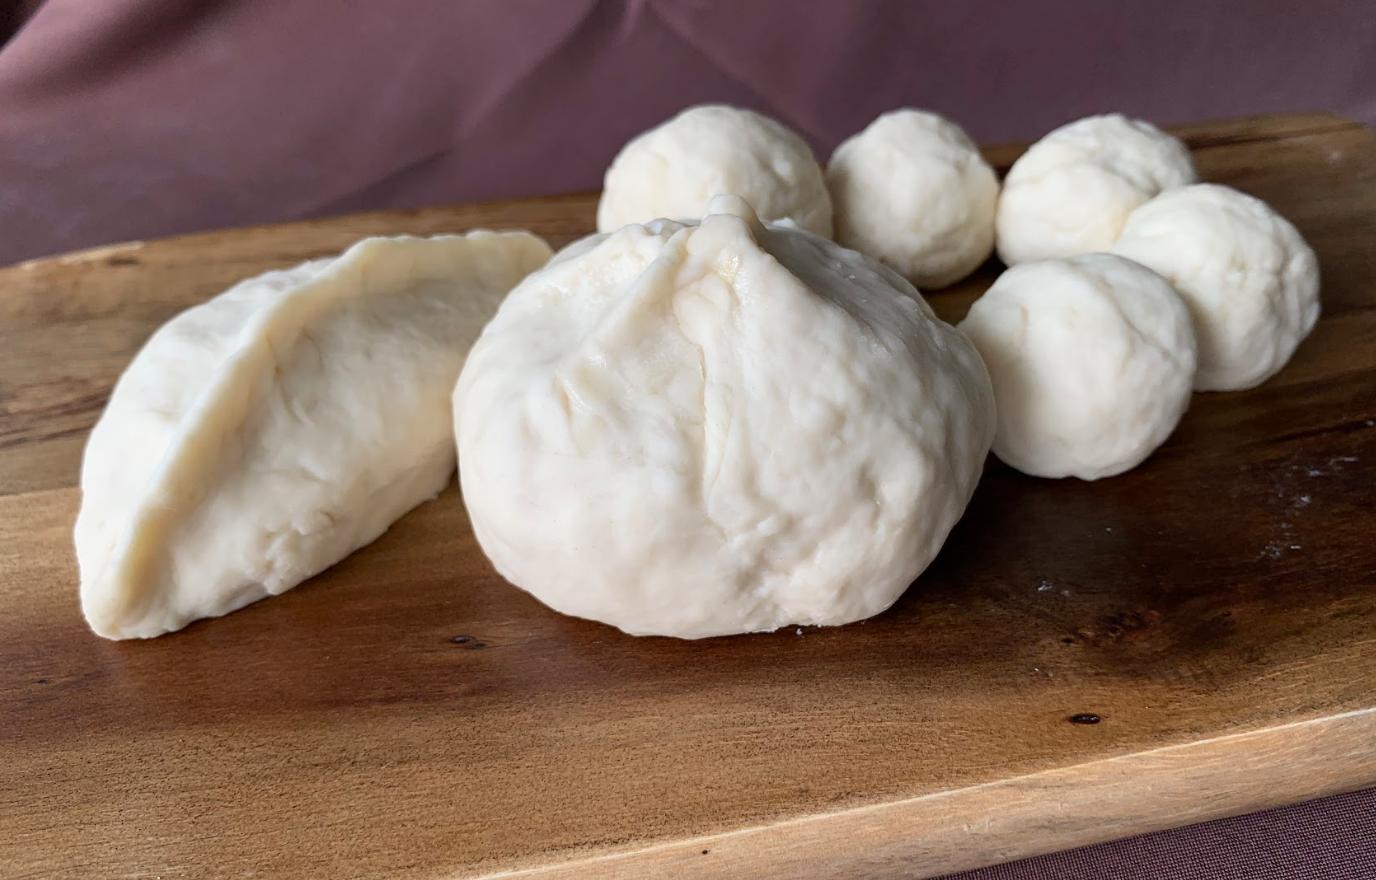 [Mdm Wong] Ka Li Pok, Bao and Agar-Agar, Flour, Salt and Water, Varied Dimensions